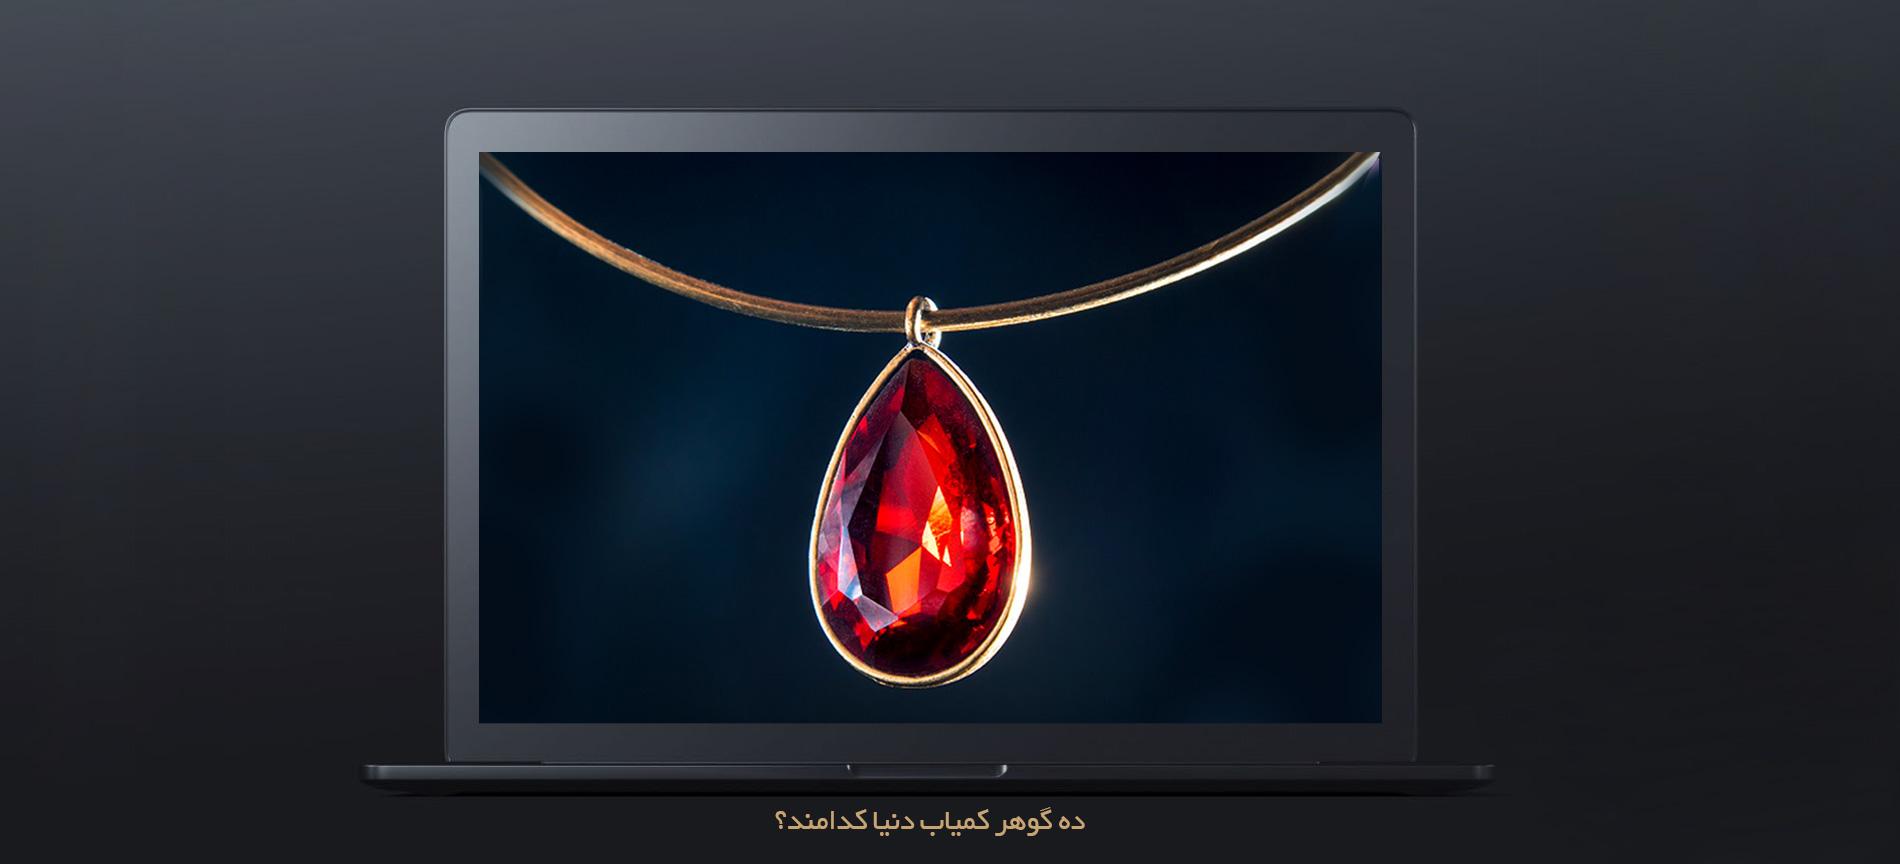 10 worlds rarest gemstones1 - ده گوهر کمیاب دنیا کدامند؟